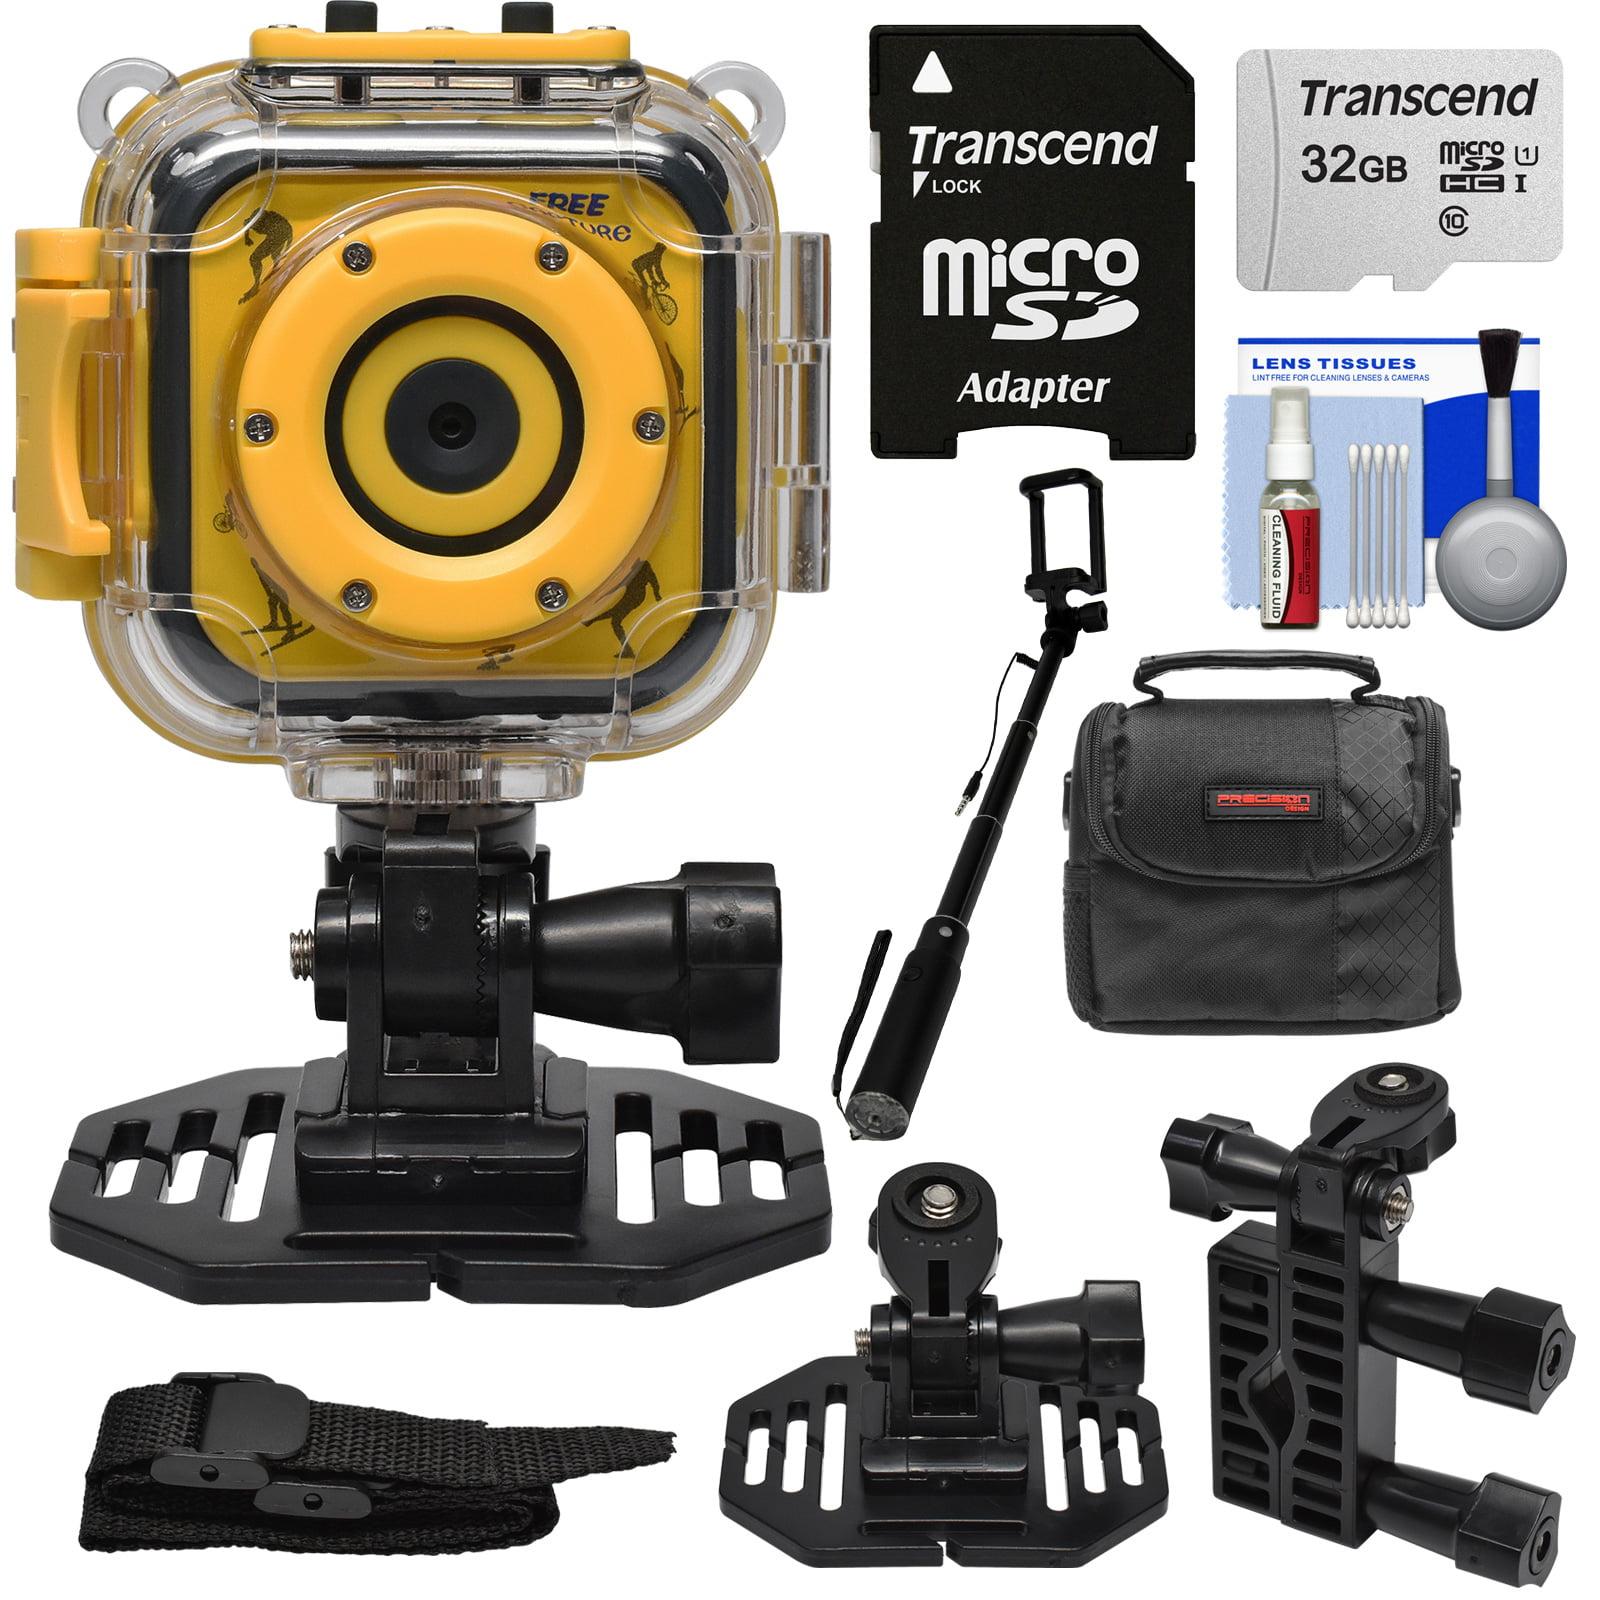 Precision Design K1 Kids HD Action Camera Camcorder (Yellow/Black) with Helmet + Handlebar Bike Mounts + 32GB Card + Case + Selfie Stick + Kit